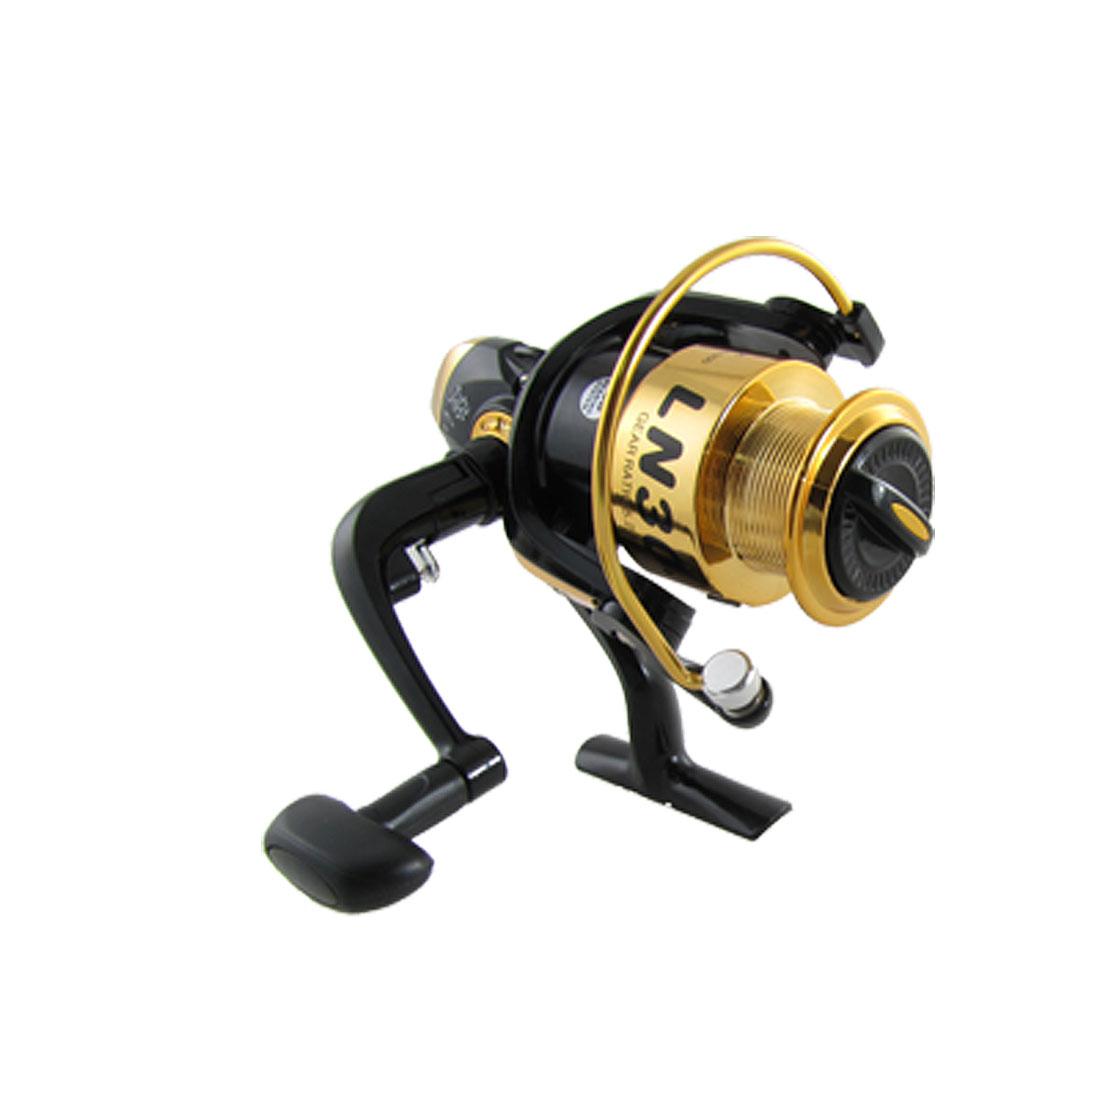 Fishing 3 Ball Bearings Spinning Reel Roller Gear Ratio 5.2:1